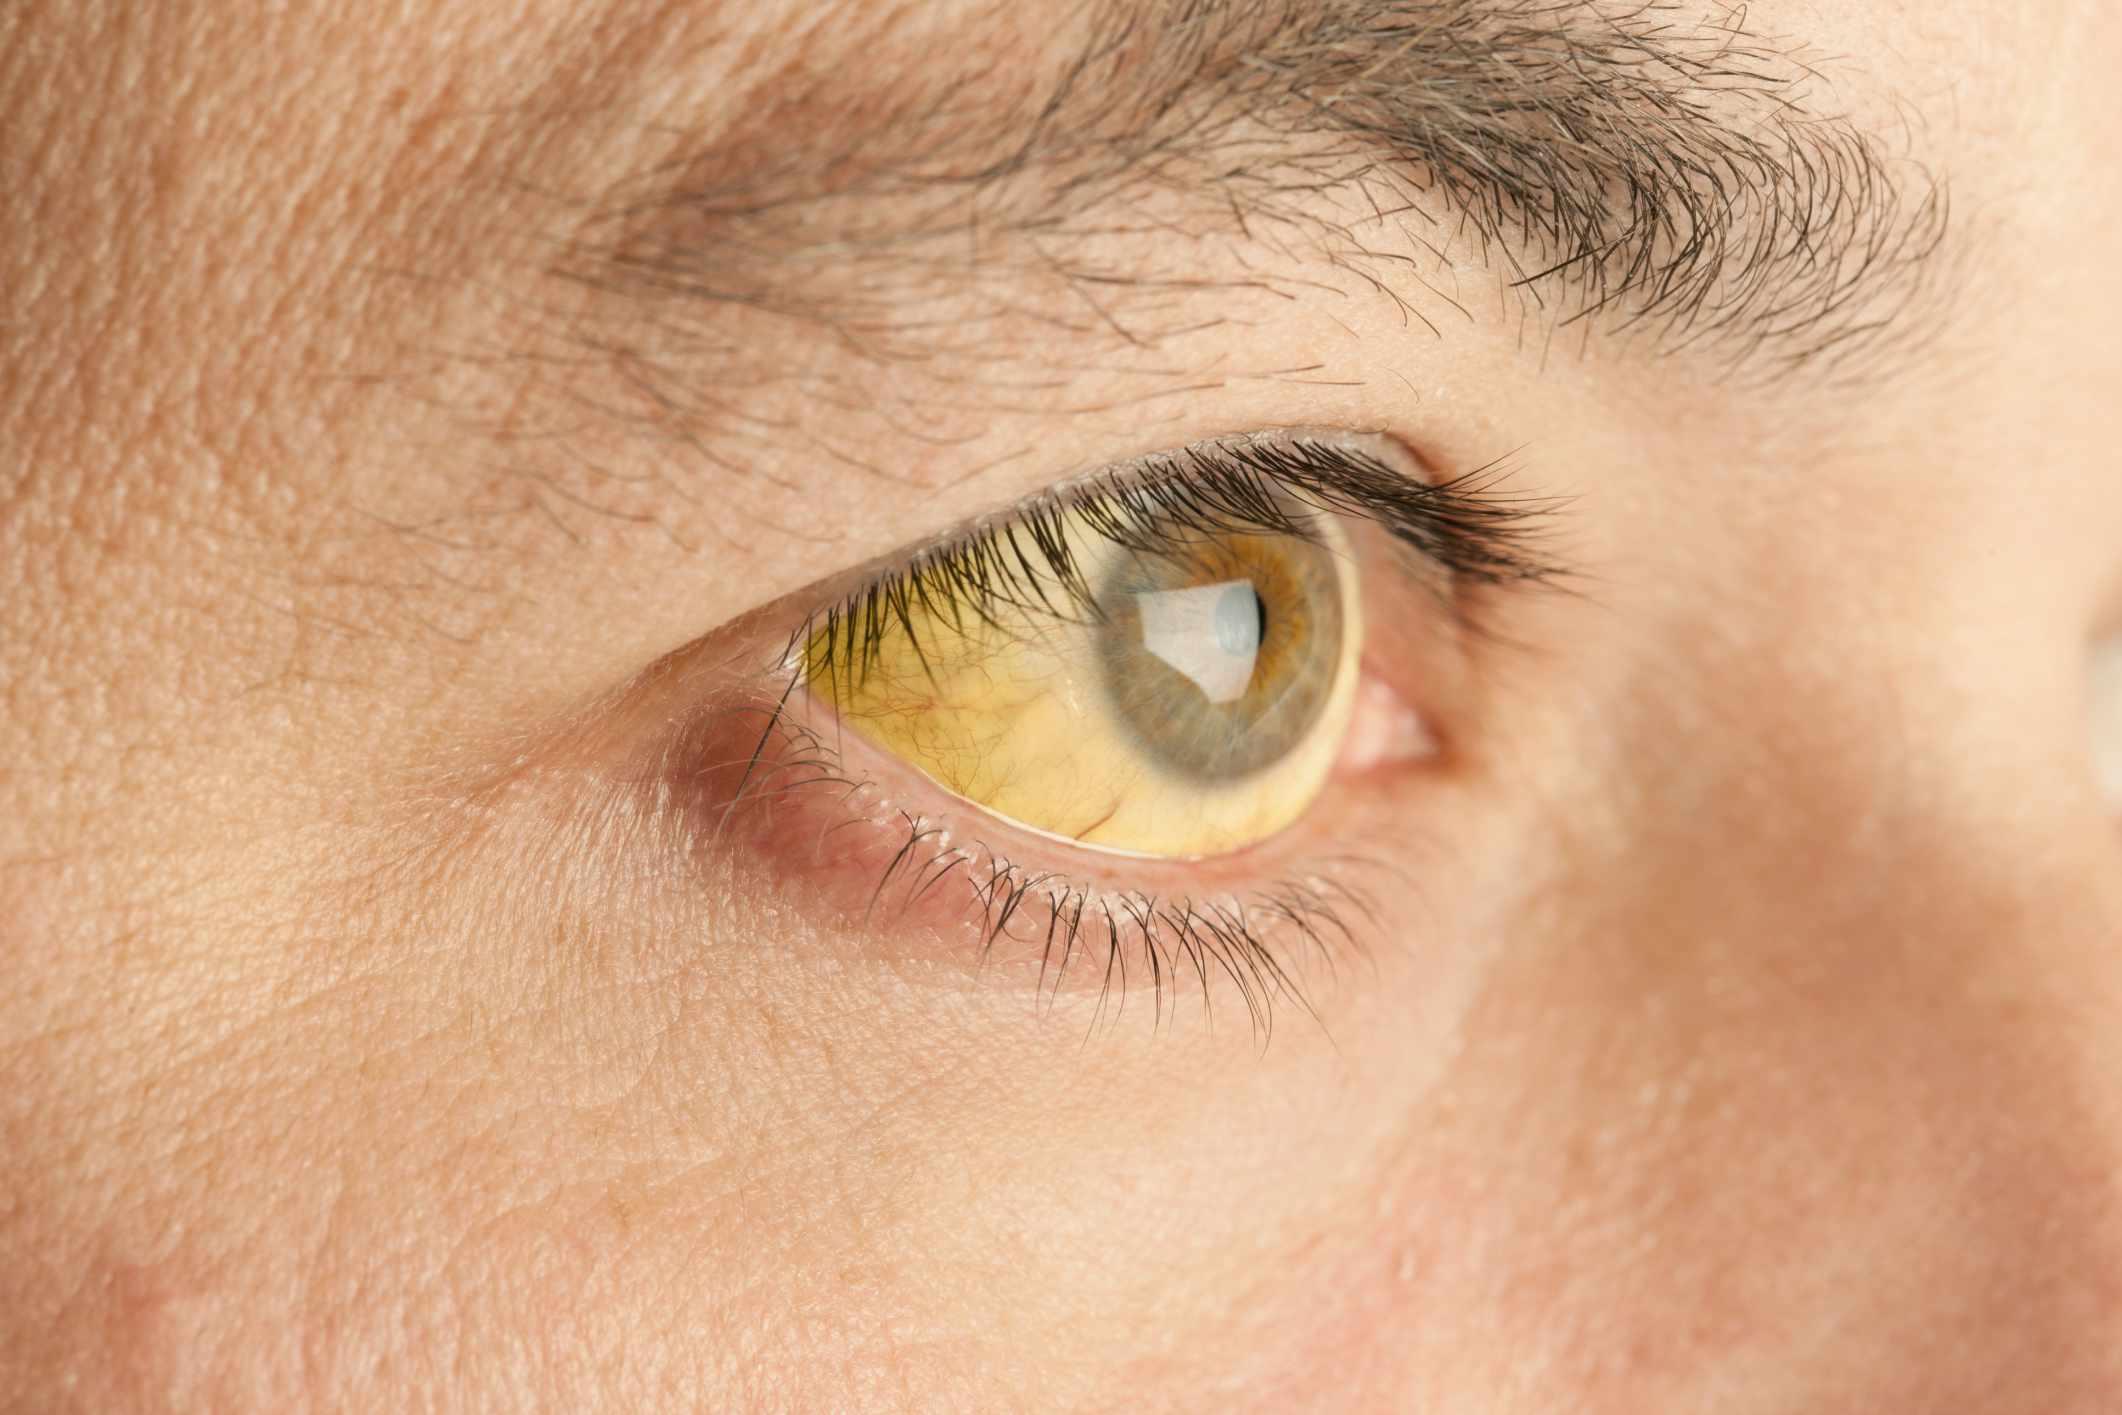 Close up of an eye with jaundice